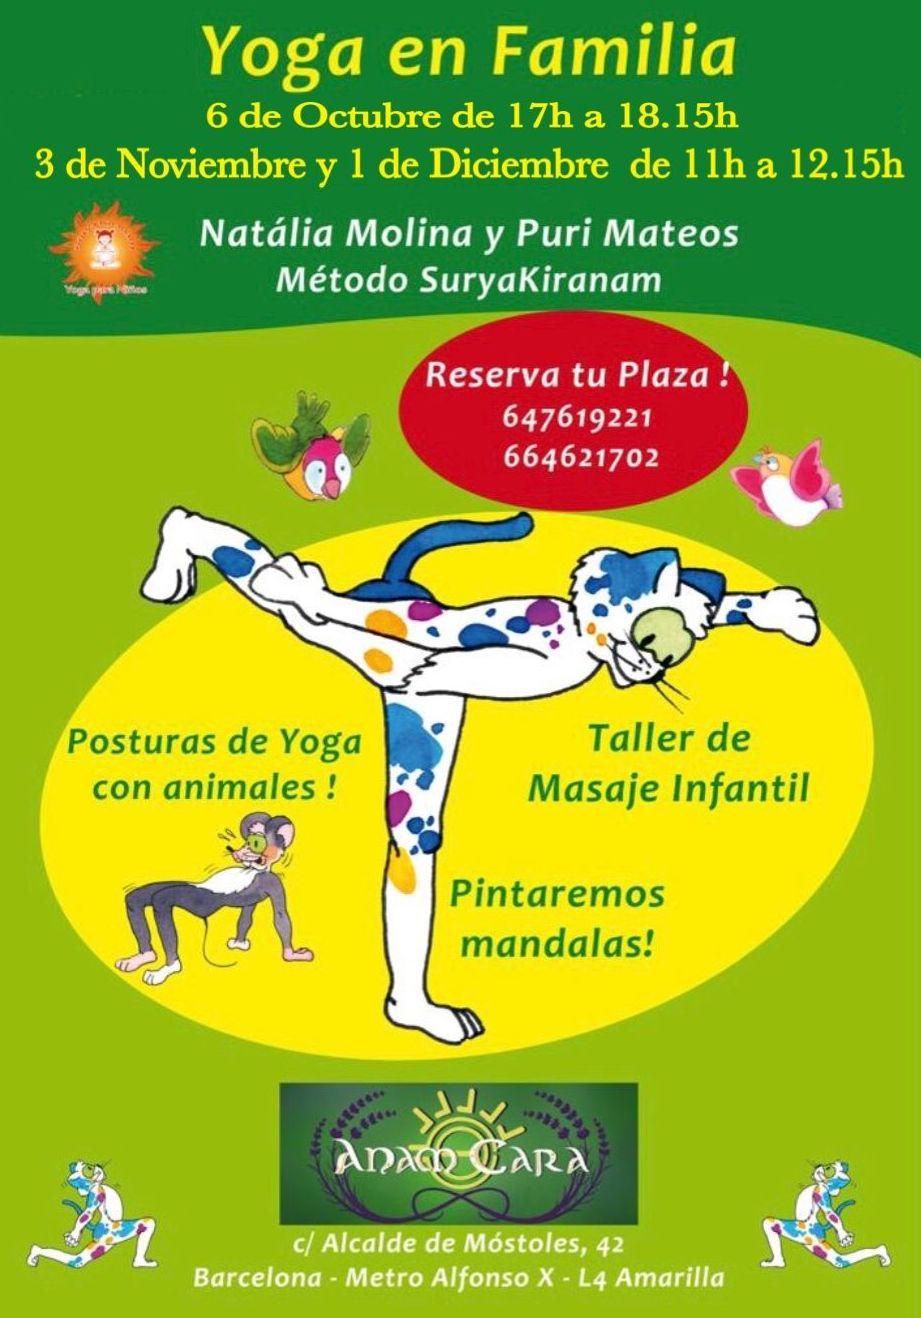 Yoga en familia para el fin de semana